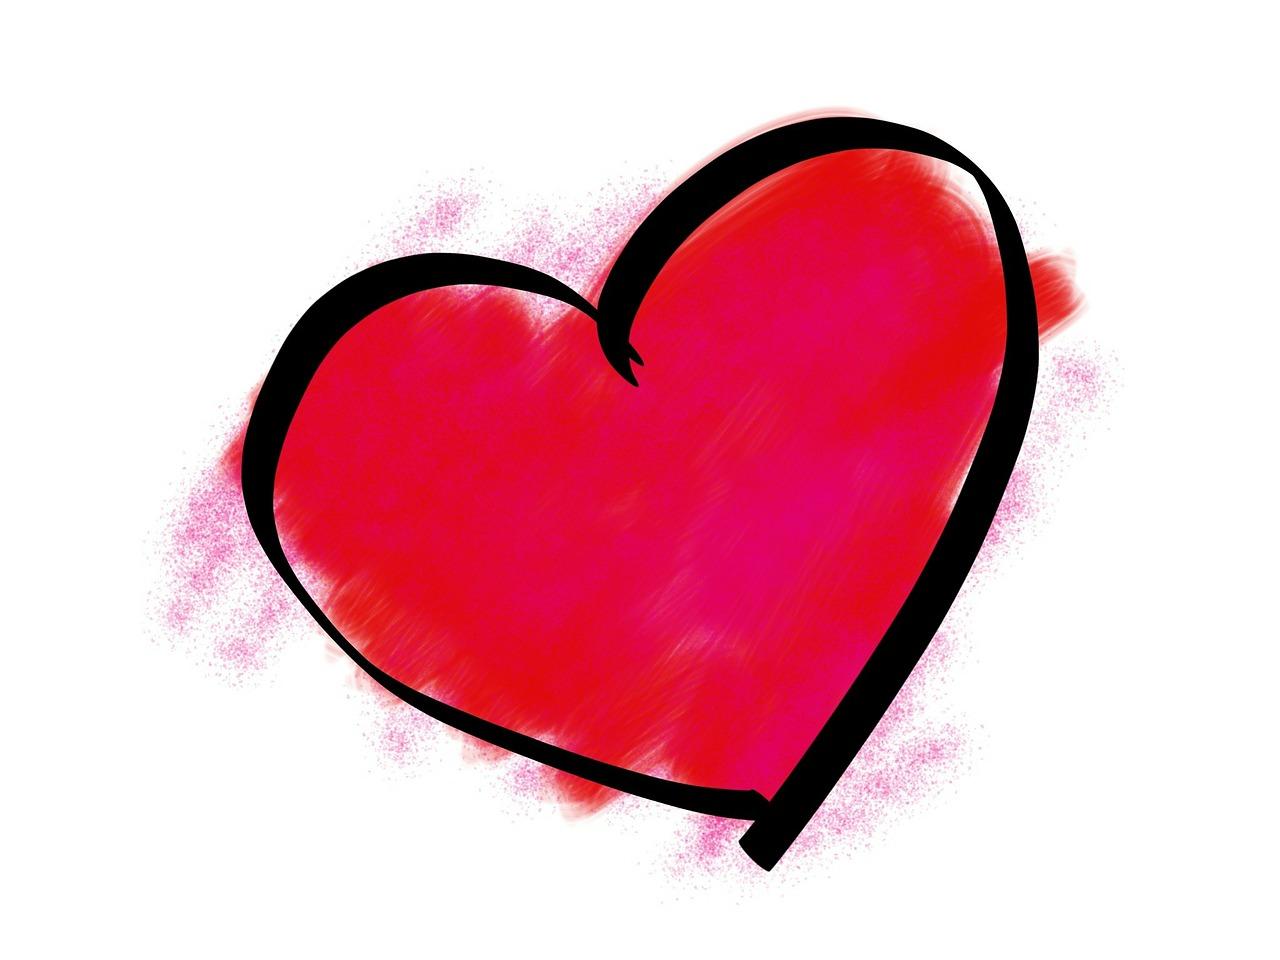 heart-192957_1280